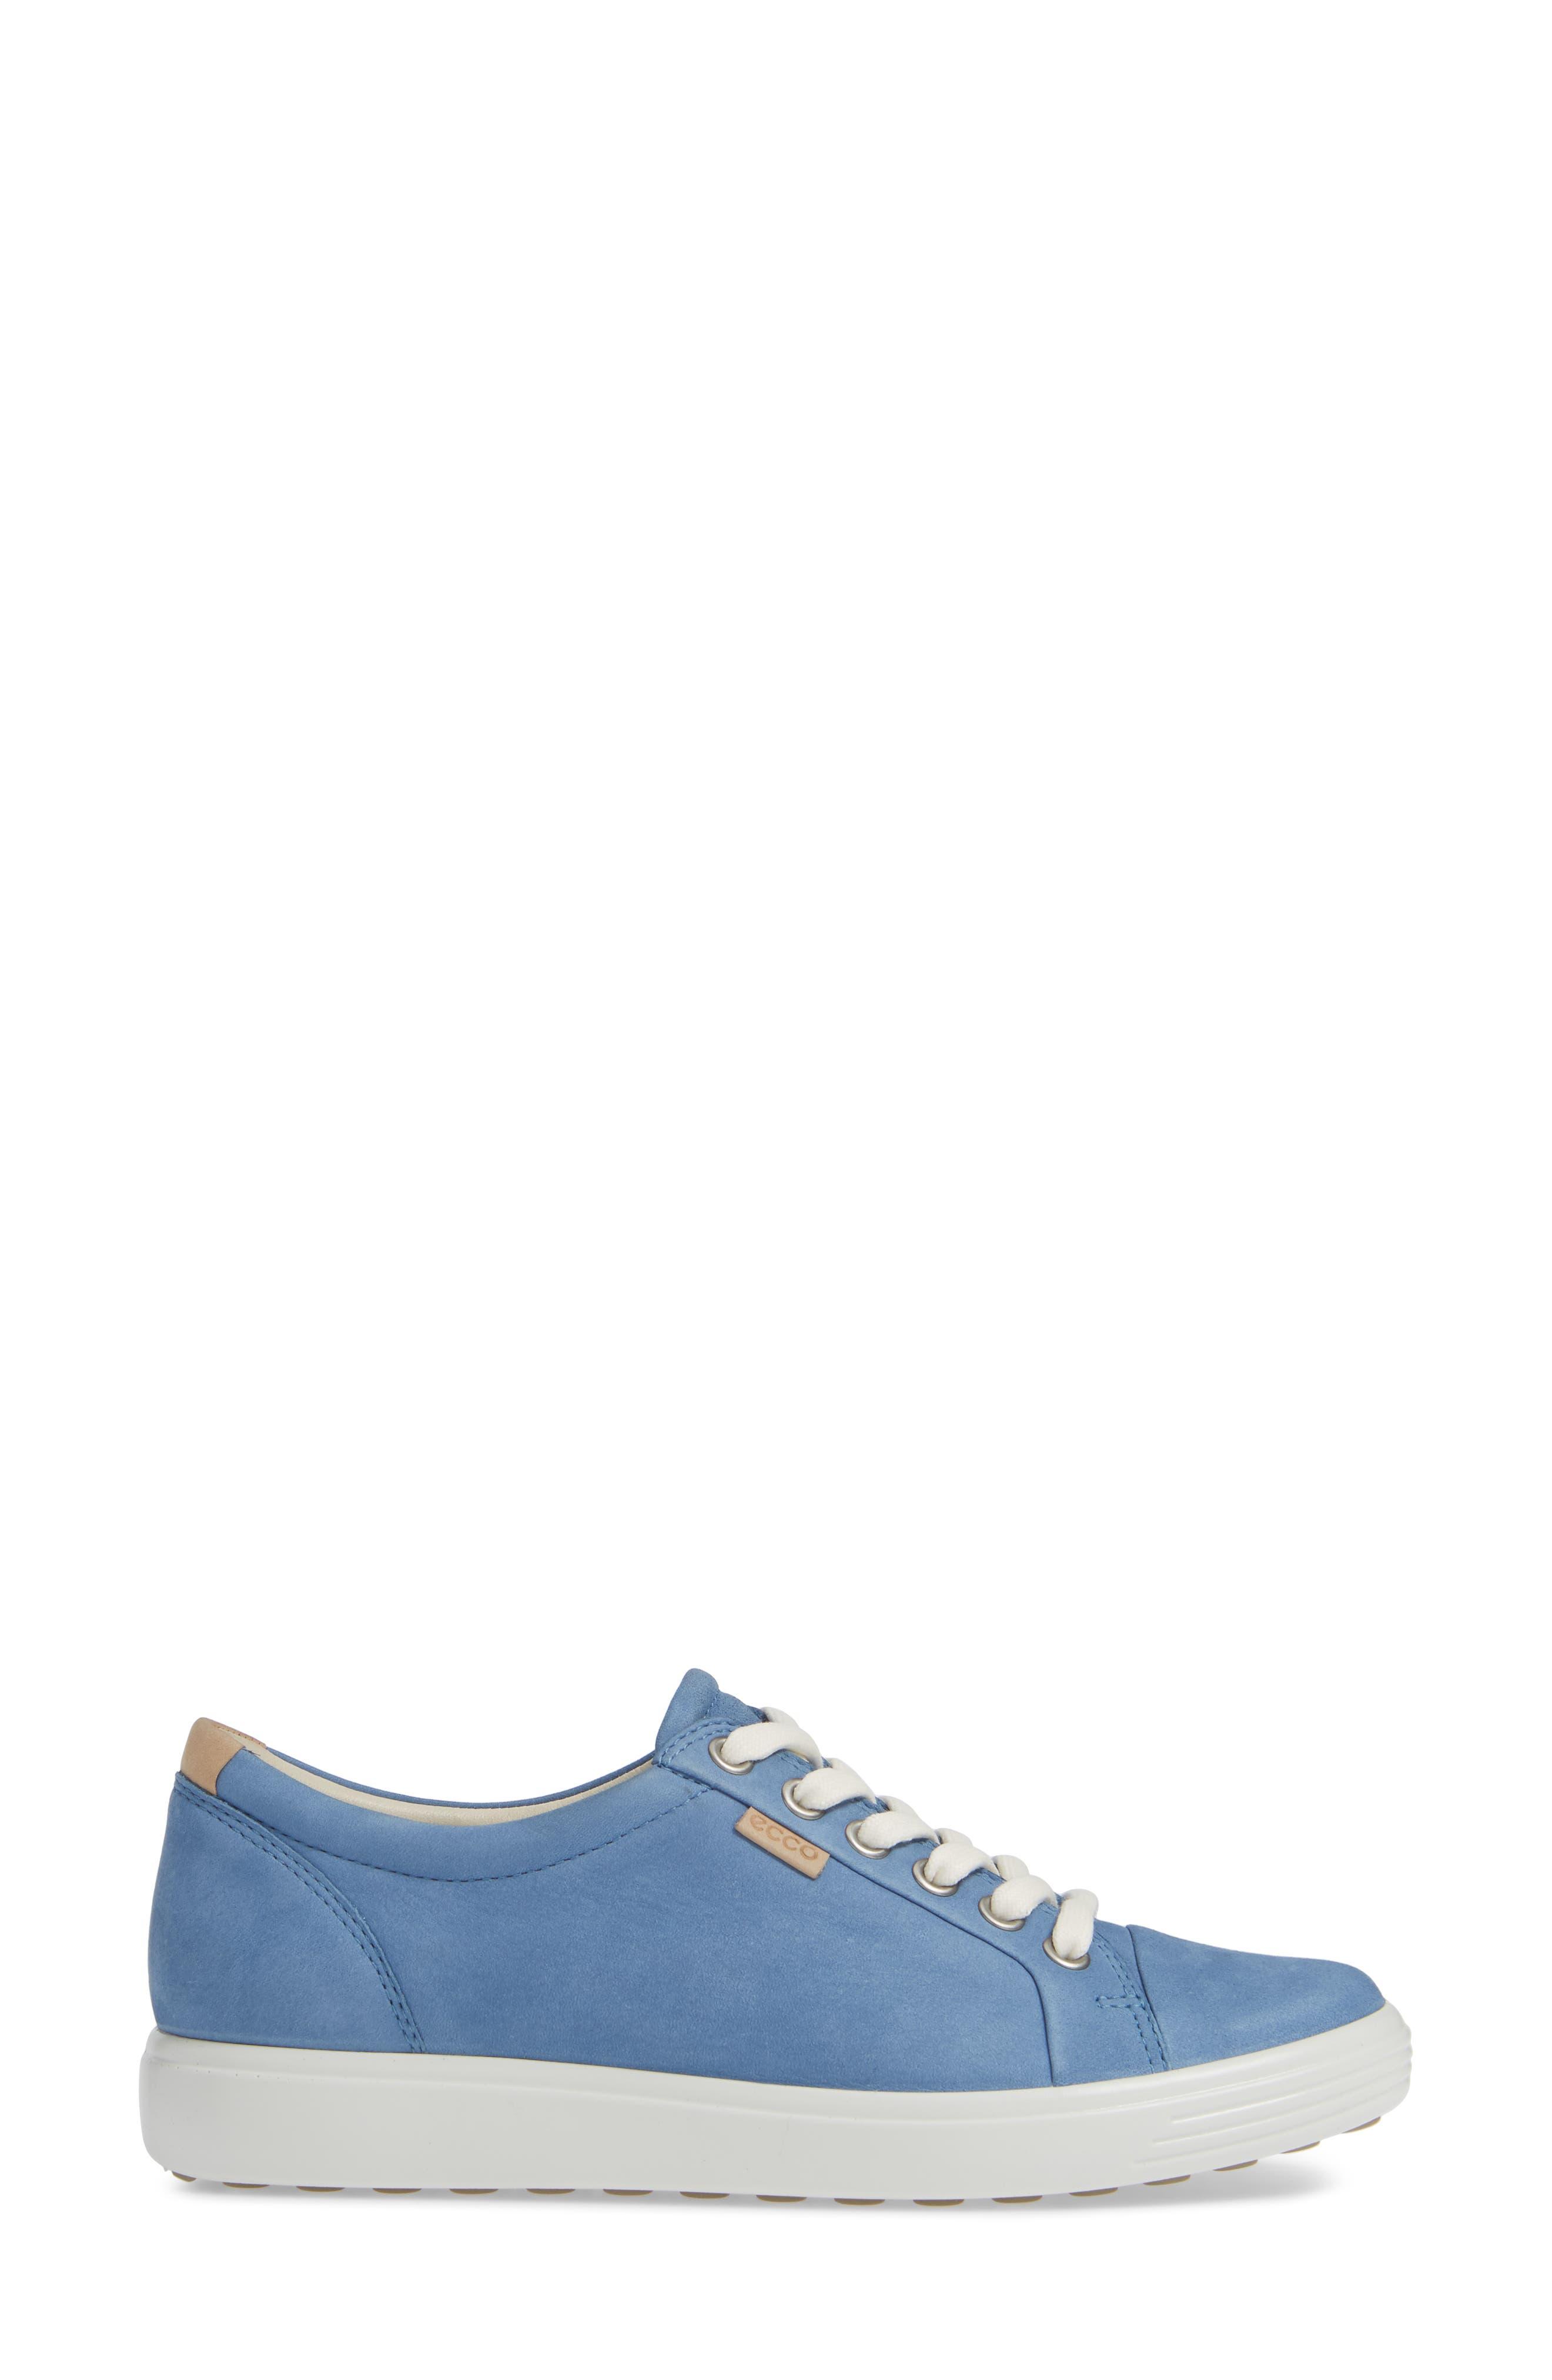 Soft 7 Sneaker,                             Alternate thumbnail 3, color,                             RETRO BLUE LEATHER